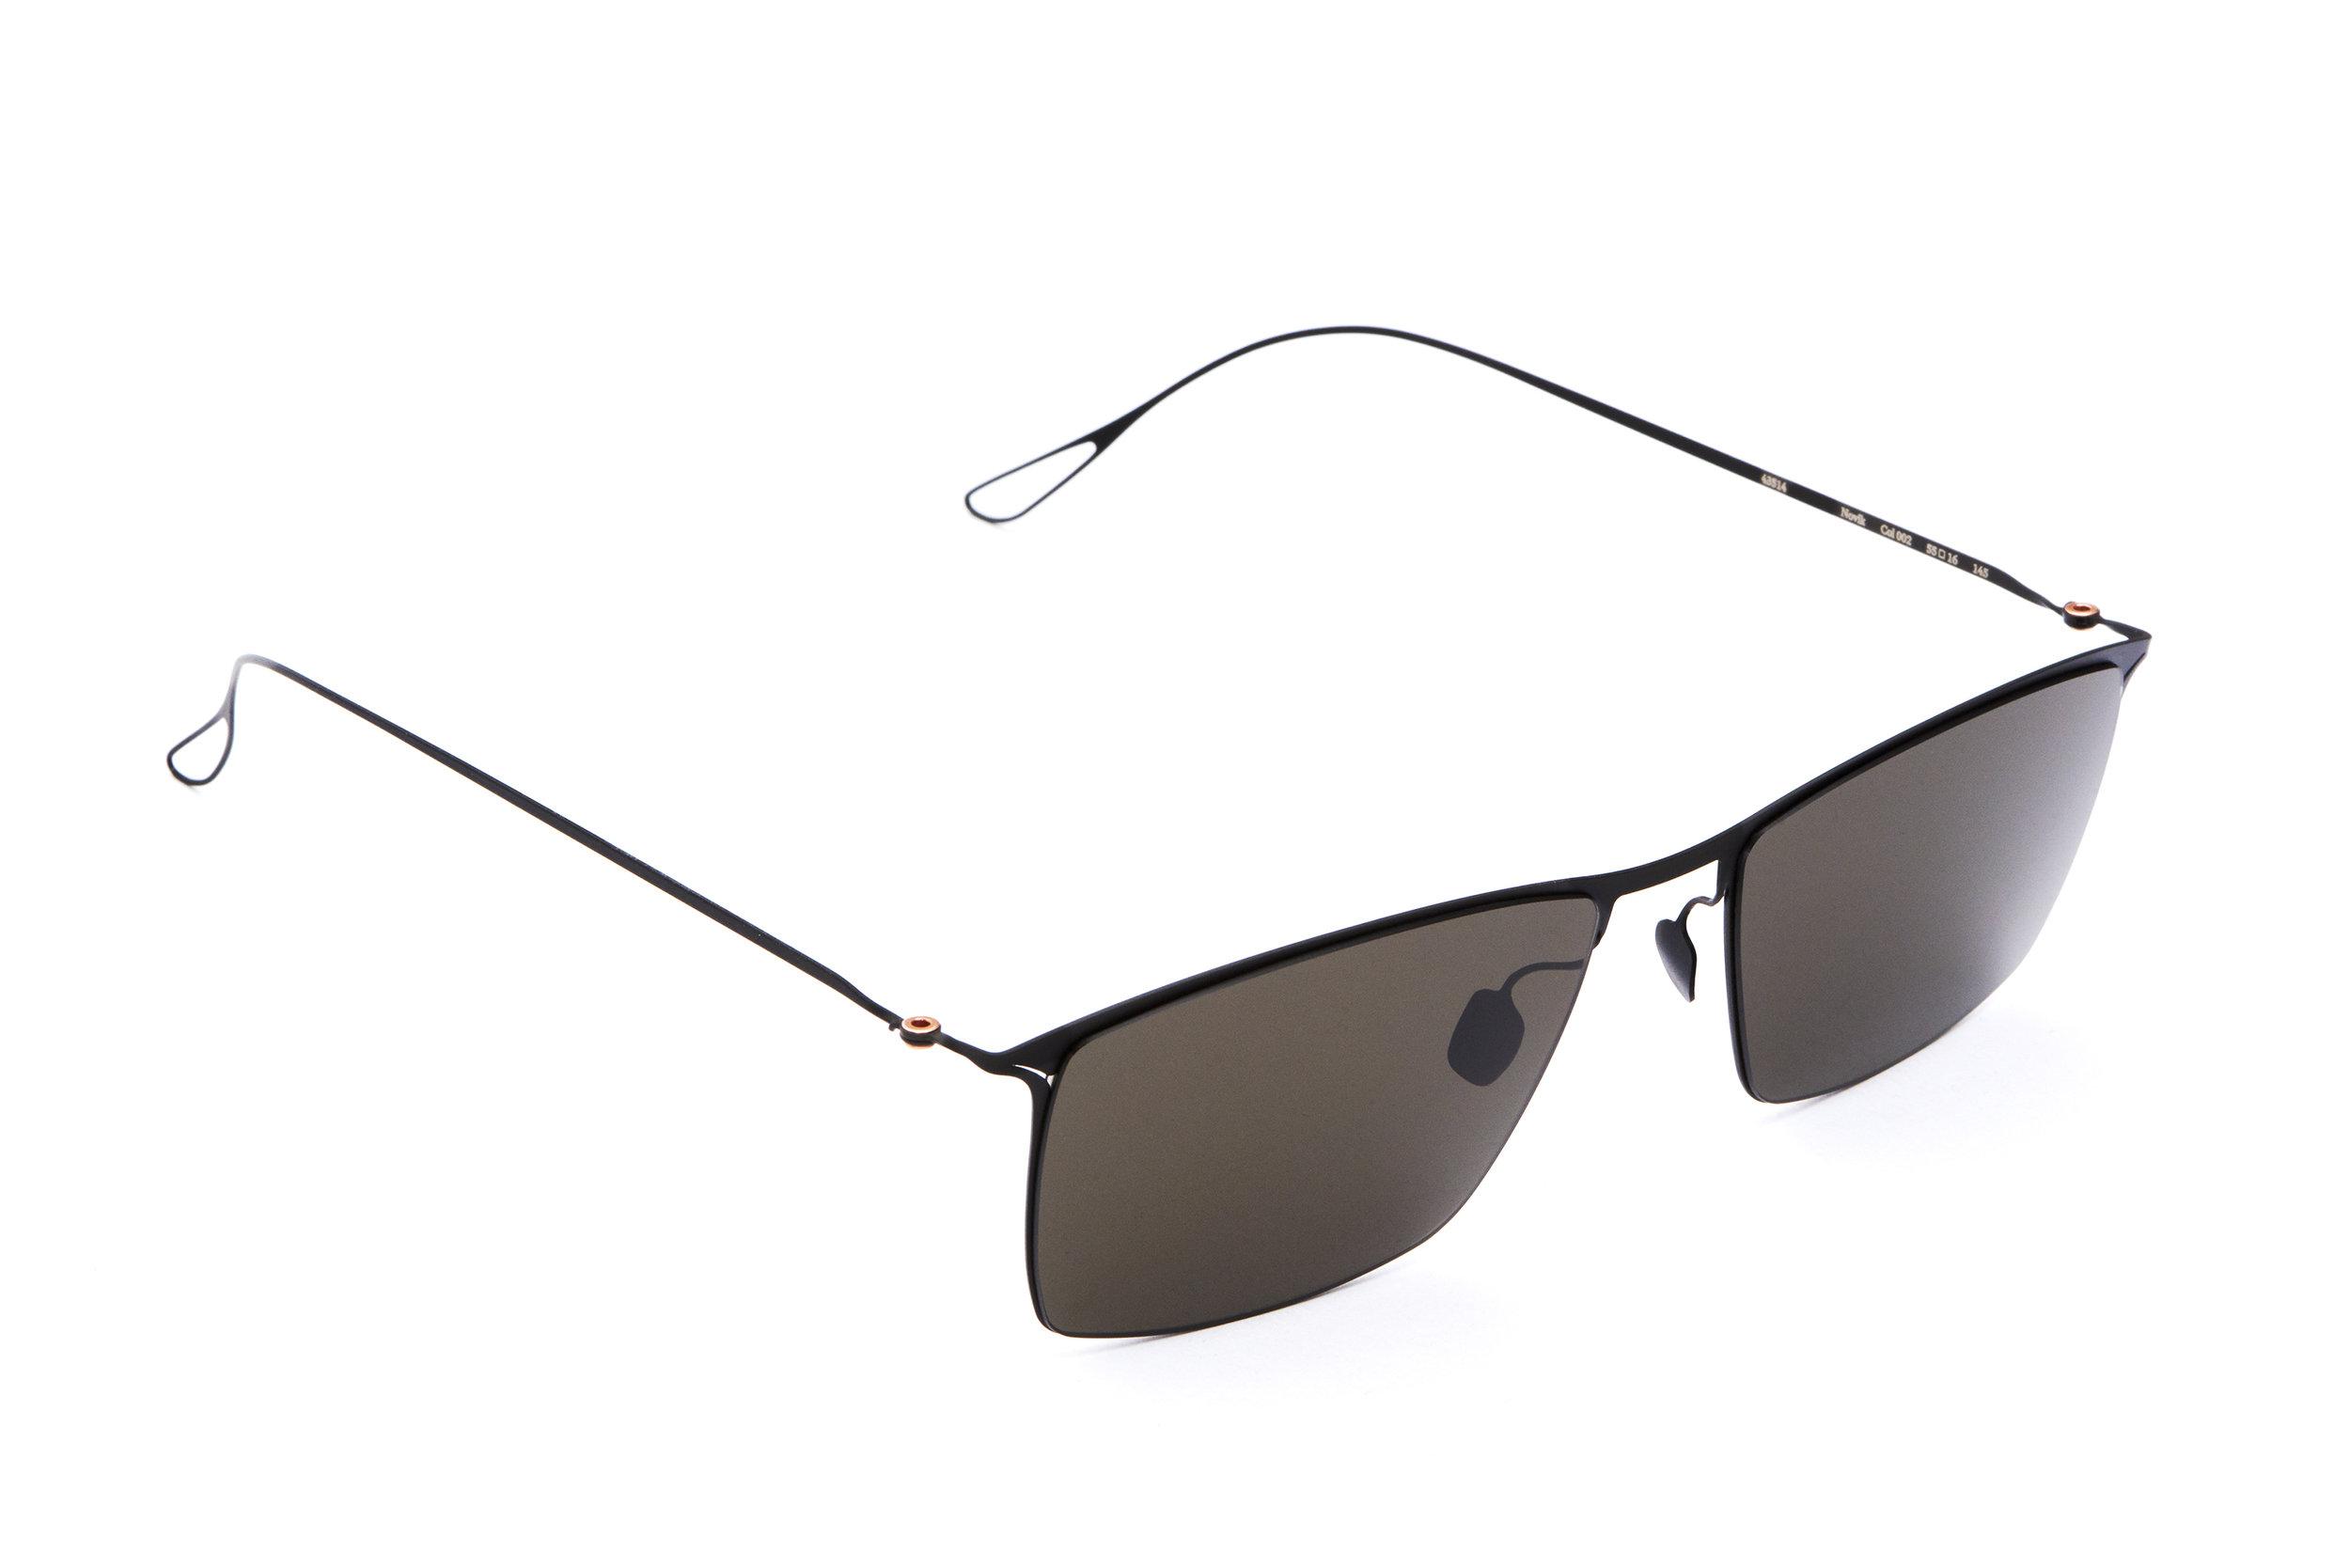 haffmans_neumeister_novik_black_grey_ultralight_sunglasses_angle_102449.jpg